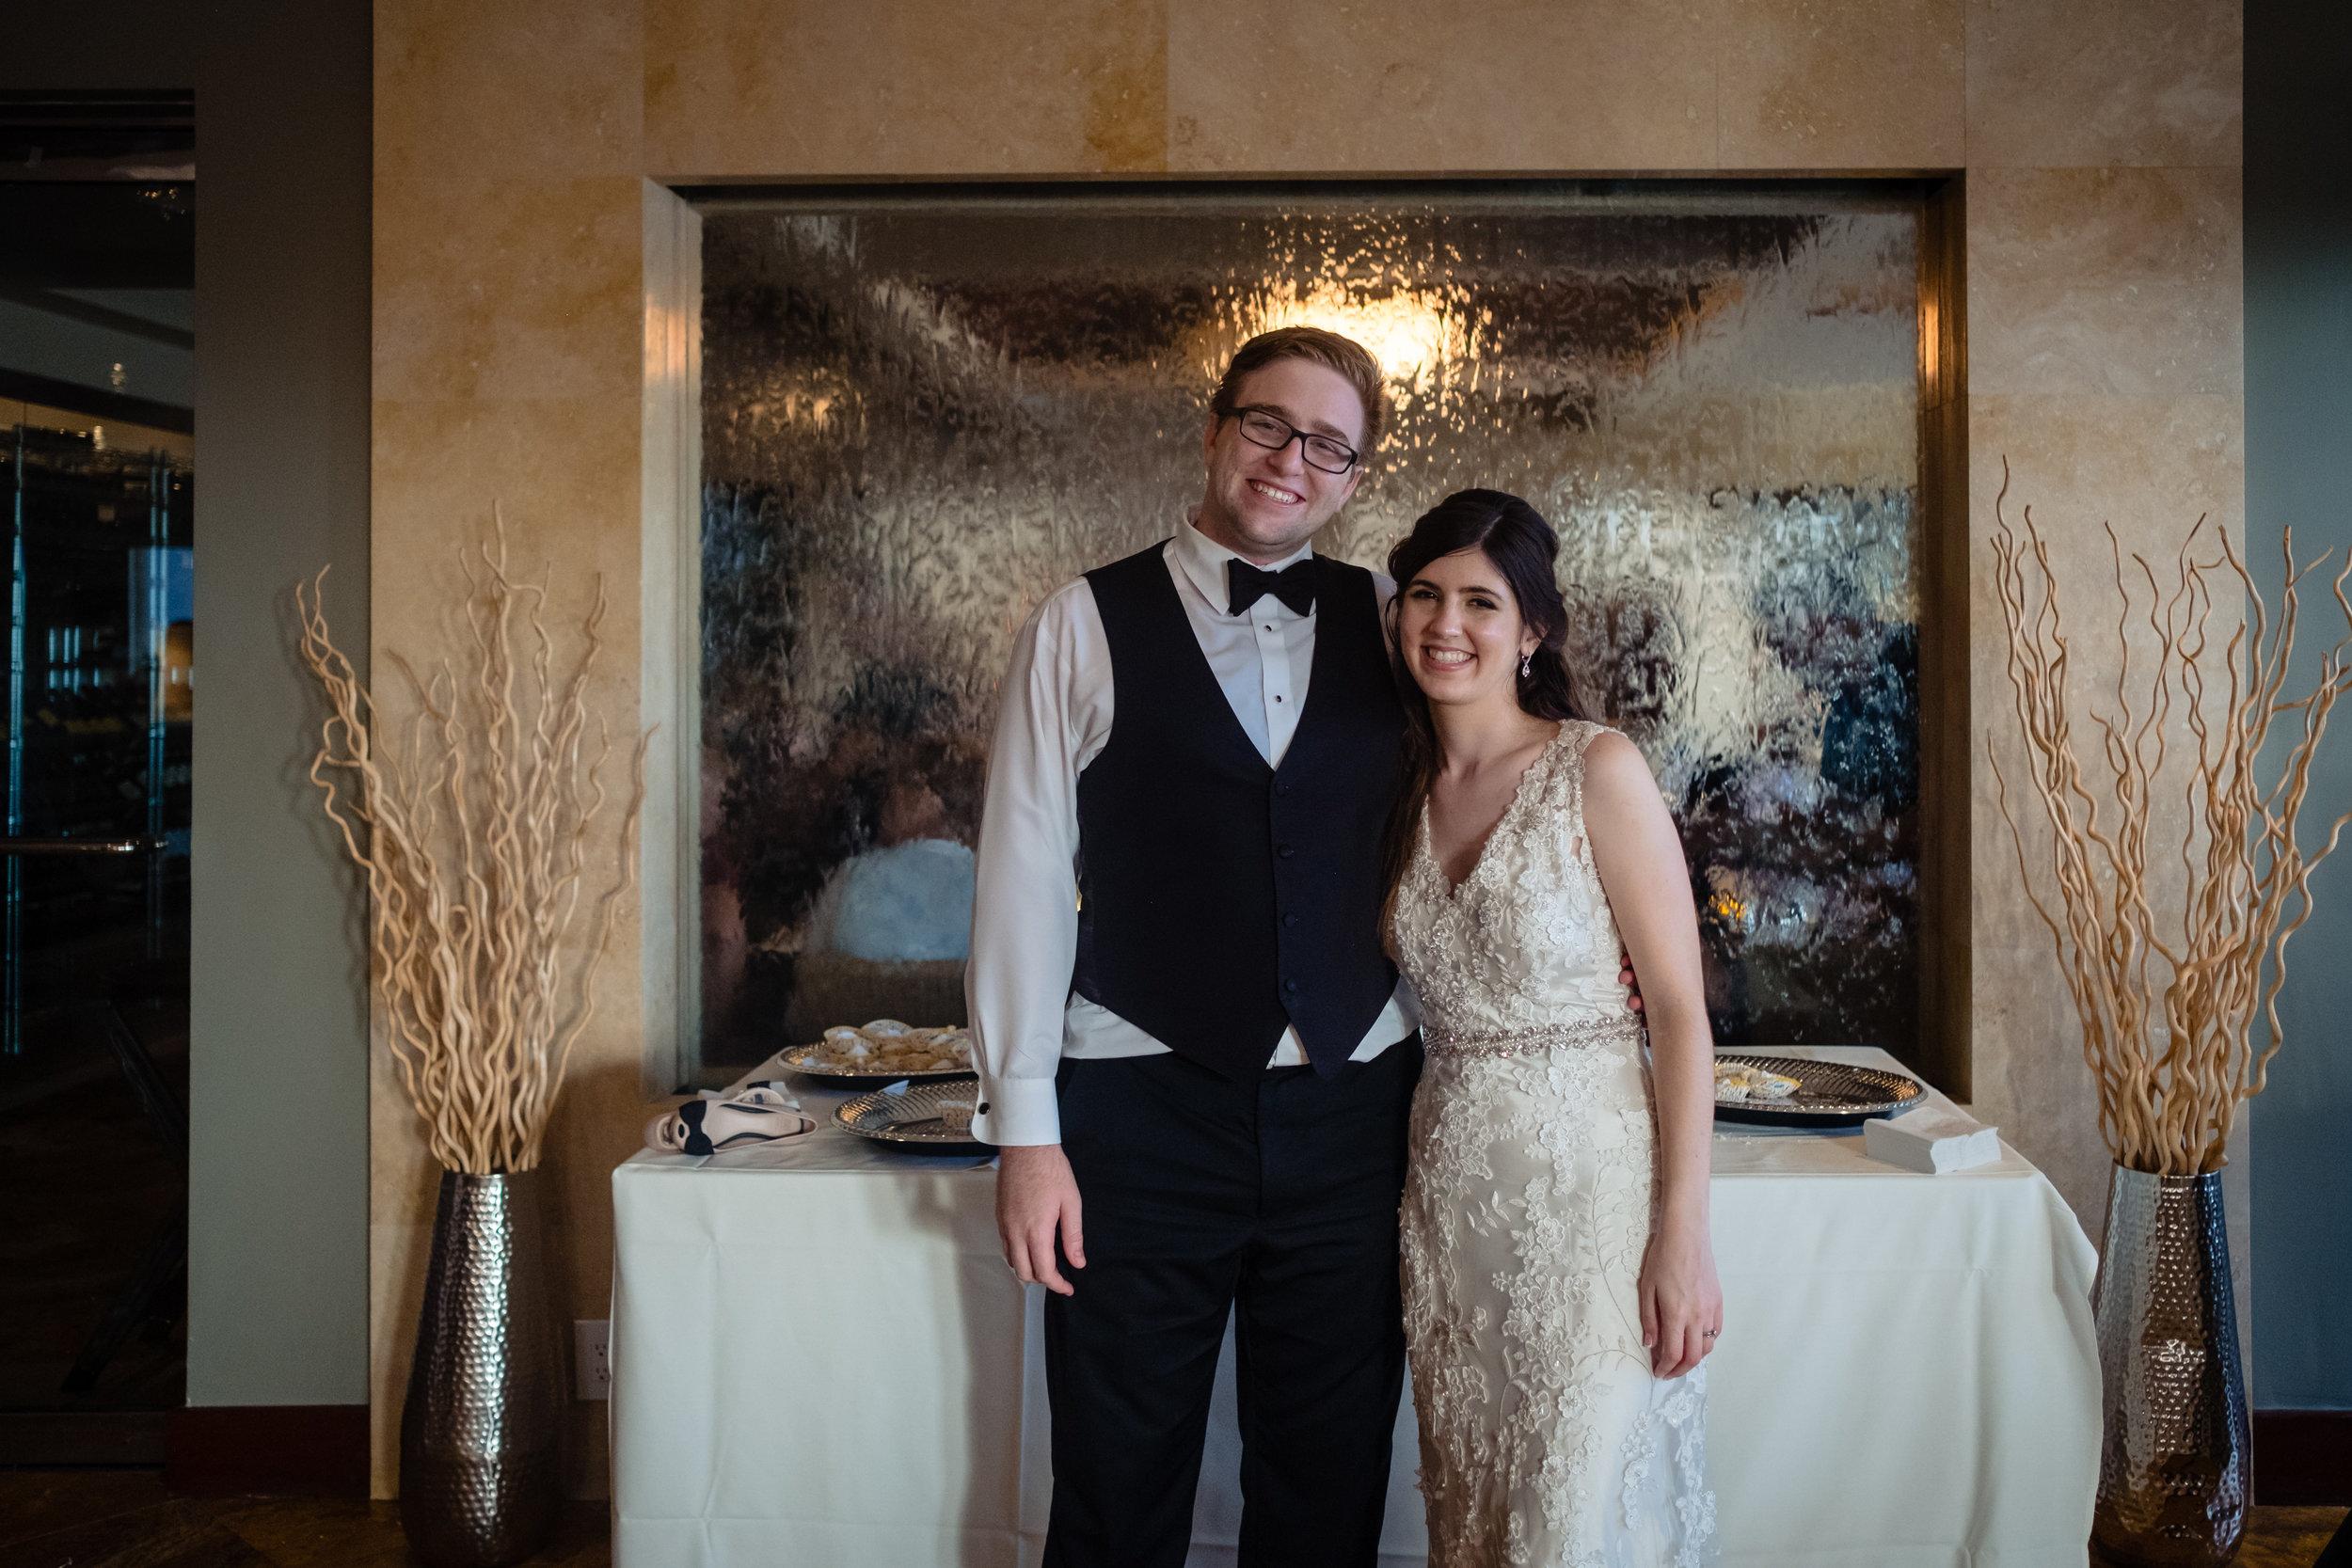 HAH_Zoe and Daniel_Clearwater Wedding_789_2018.jpg